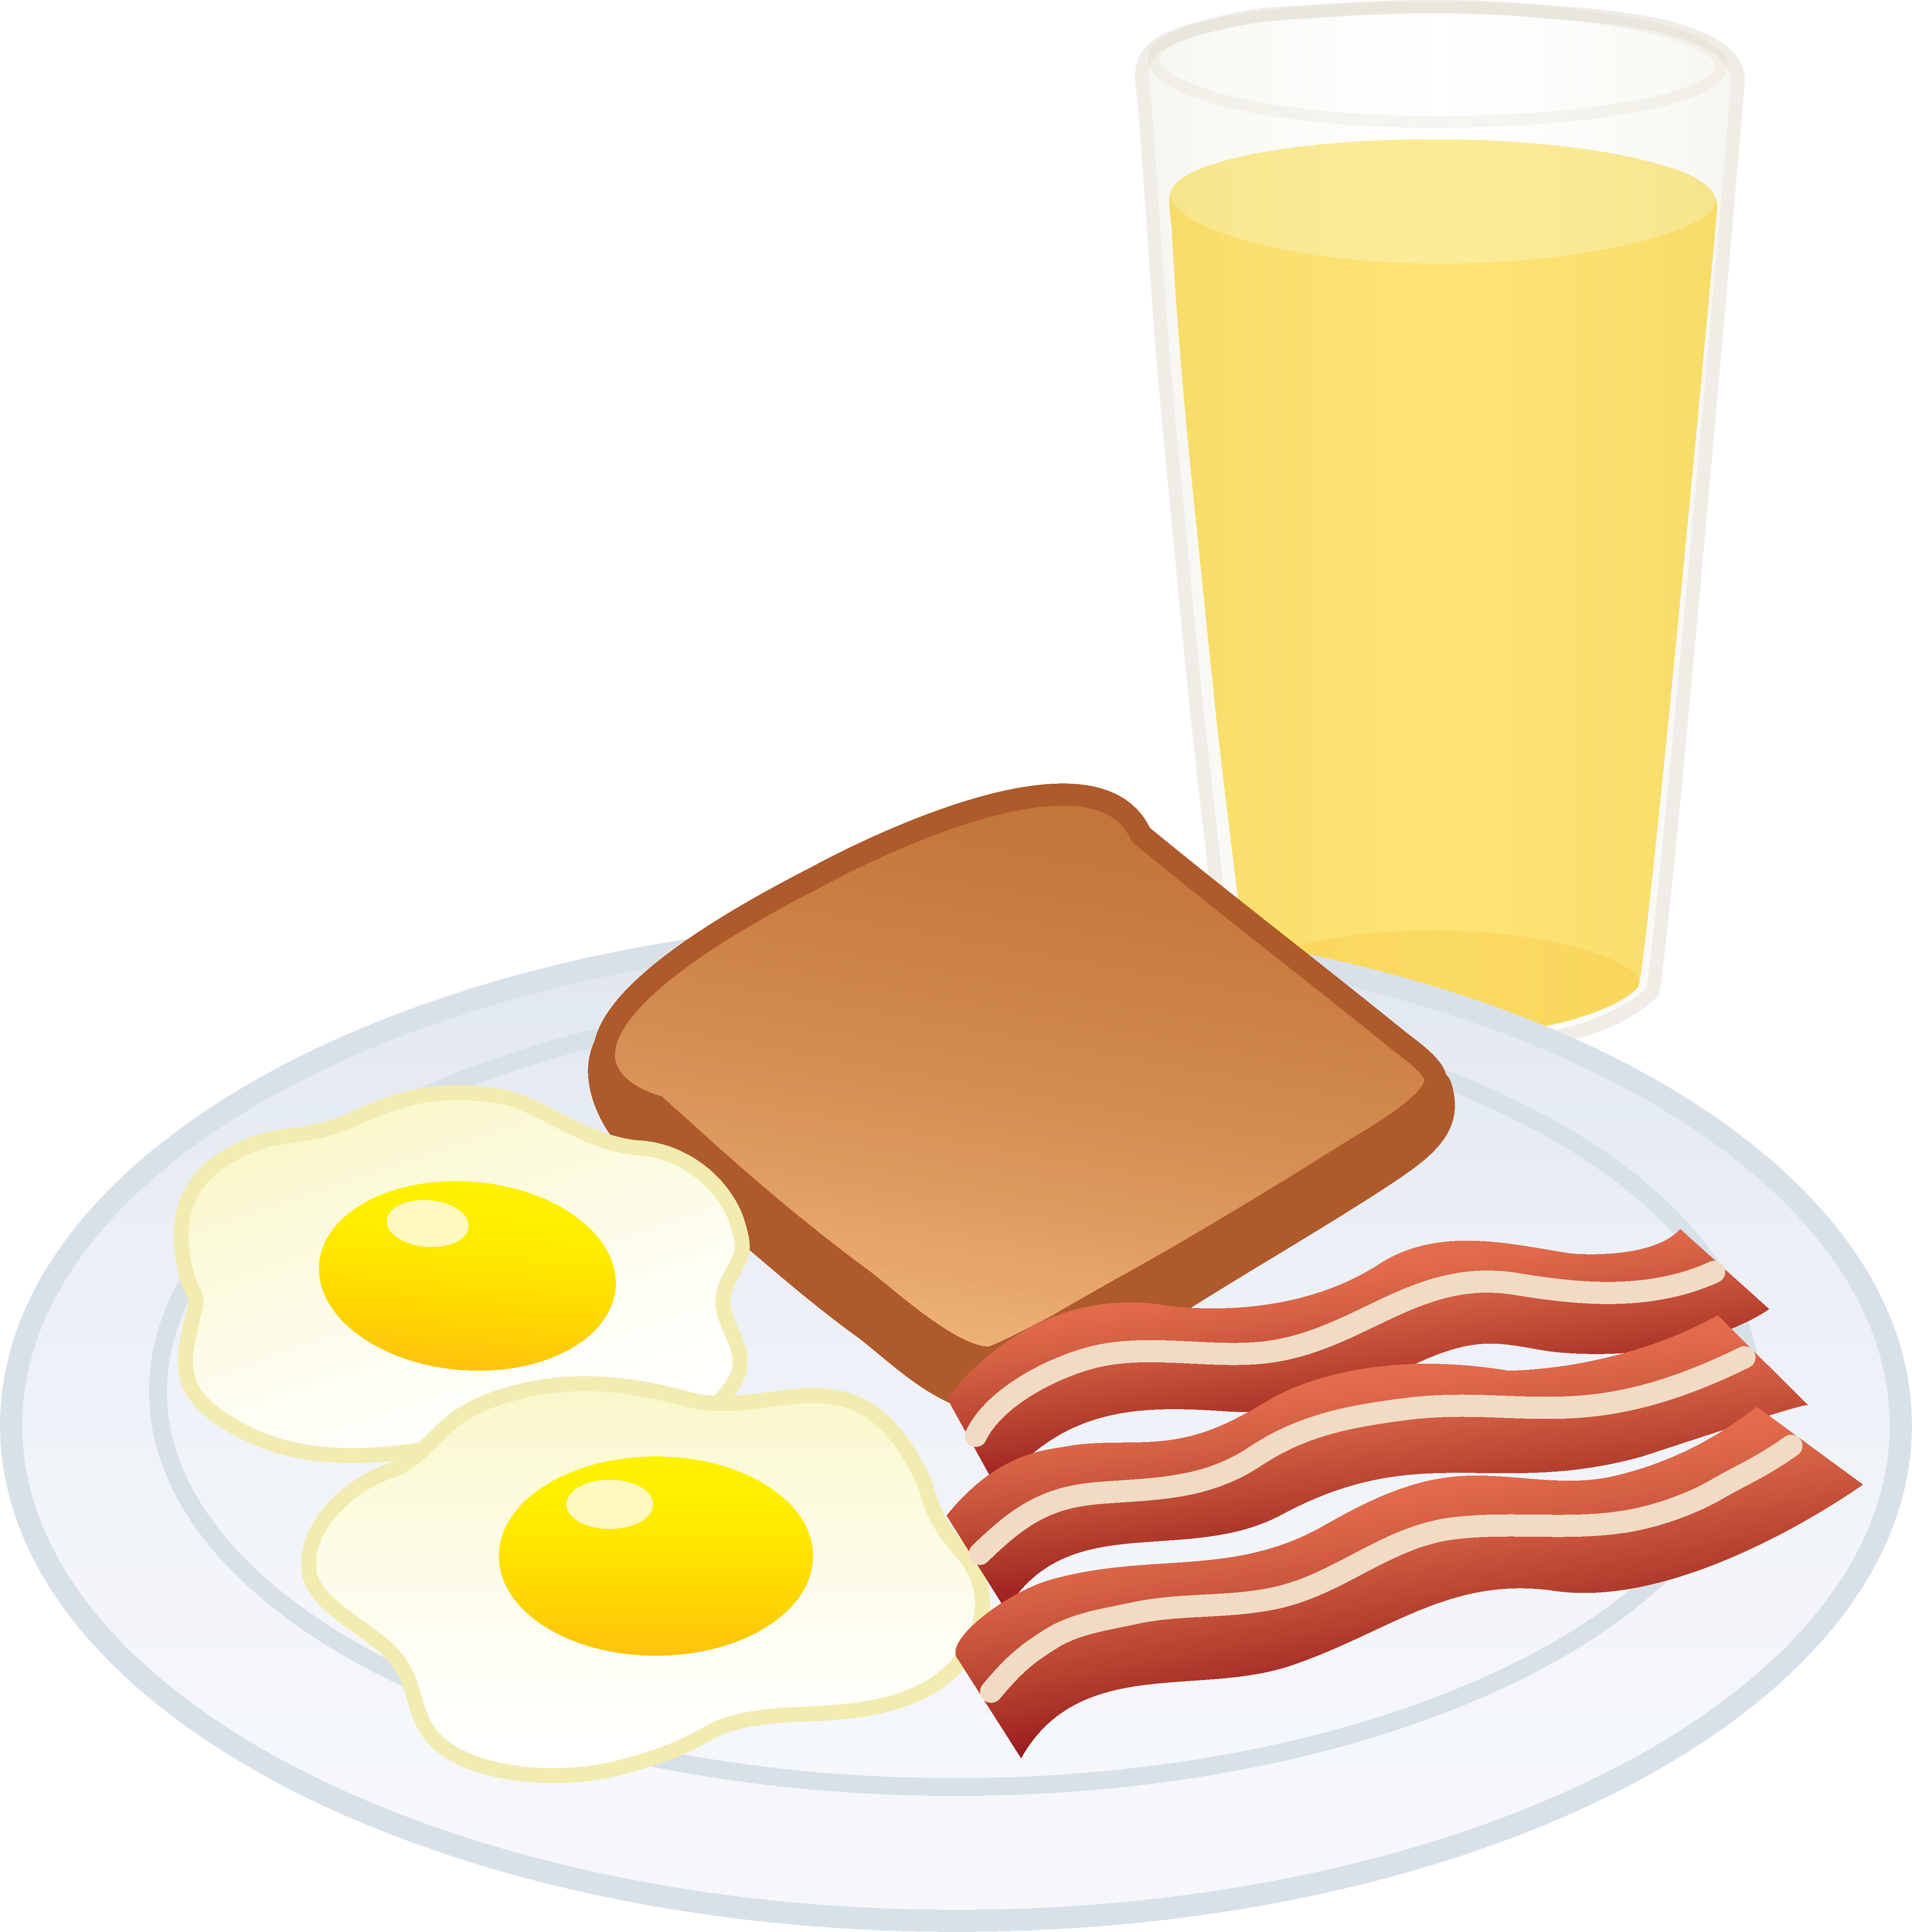 Free Breakfast Food Cliparts, Download Free Clip Art, Free Clip Art.